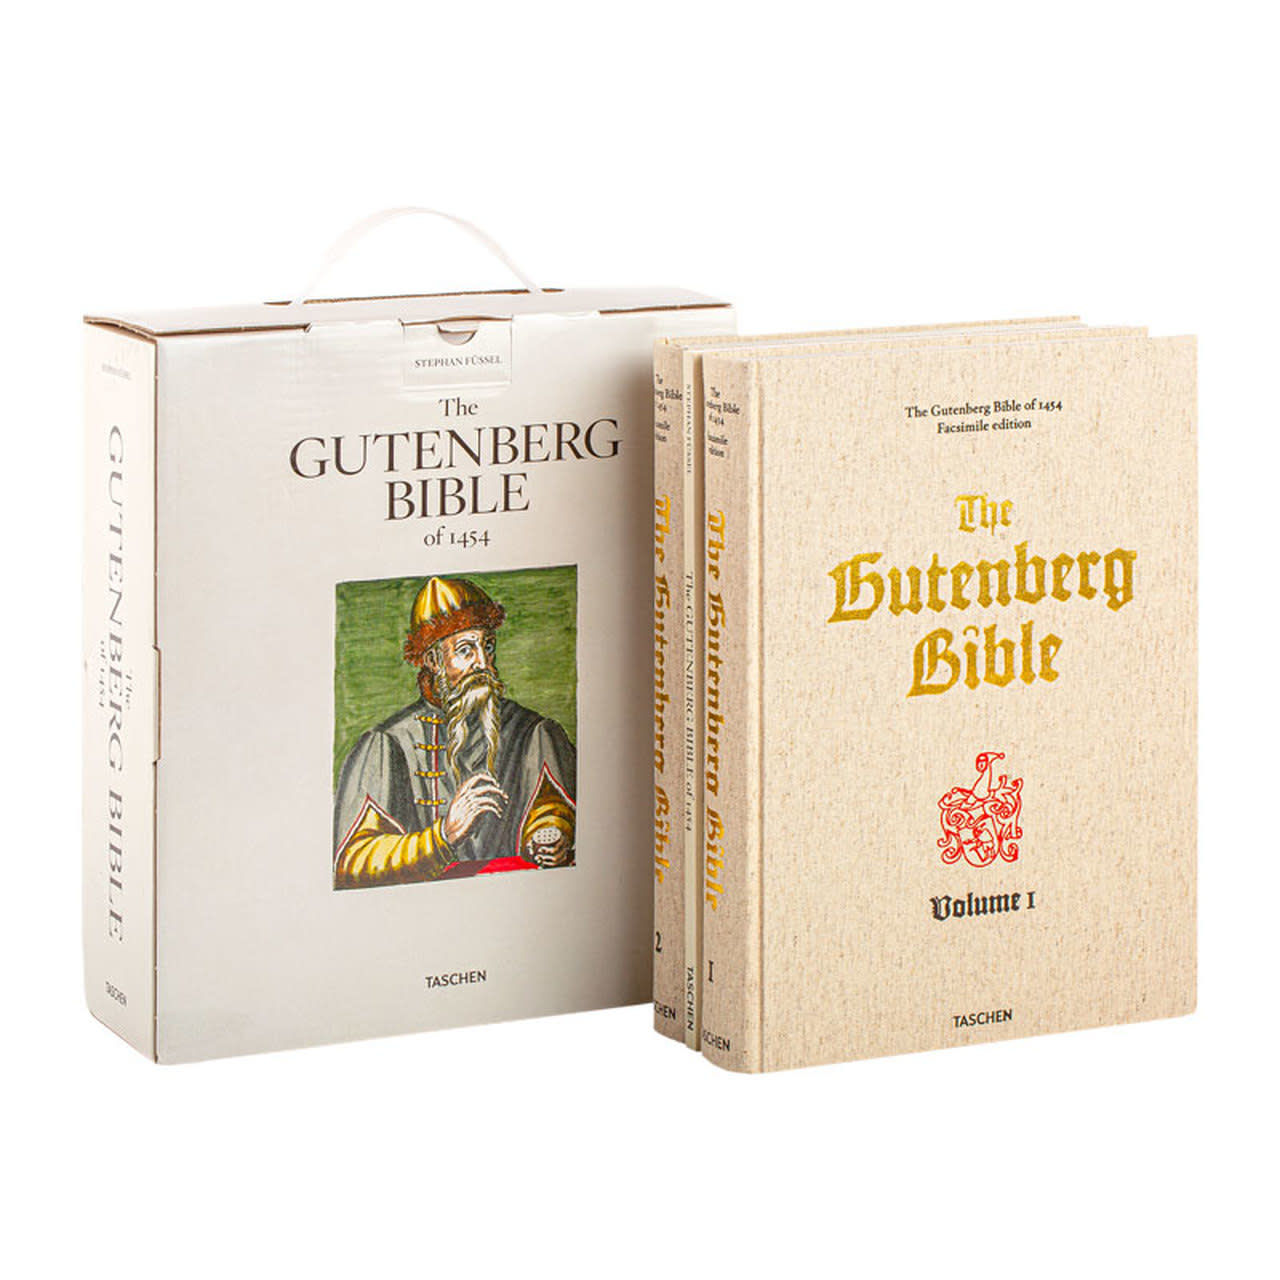 Taschen Gutenberg Bible of 1454